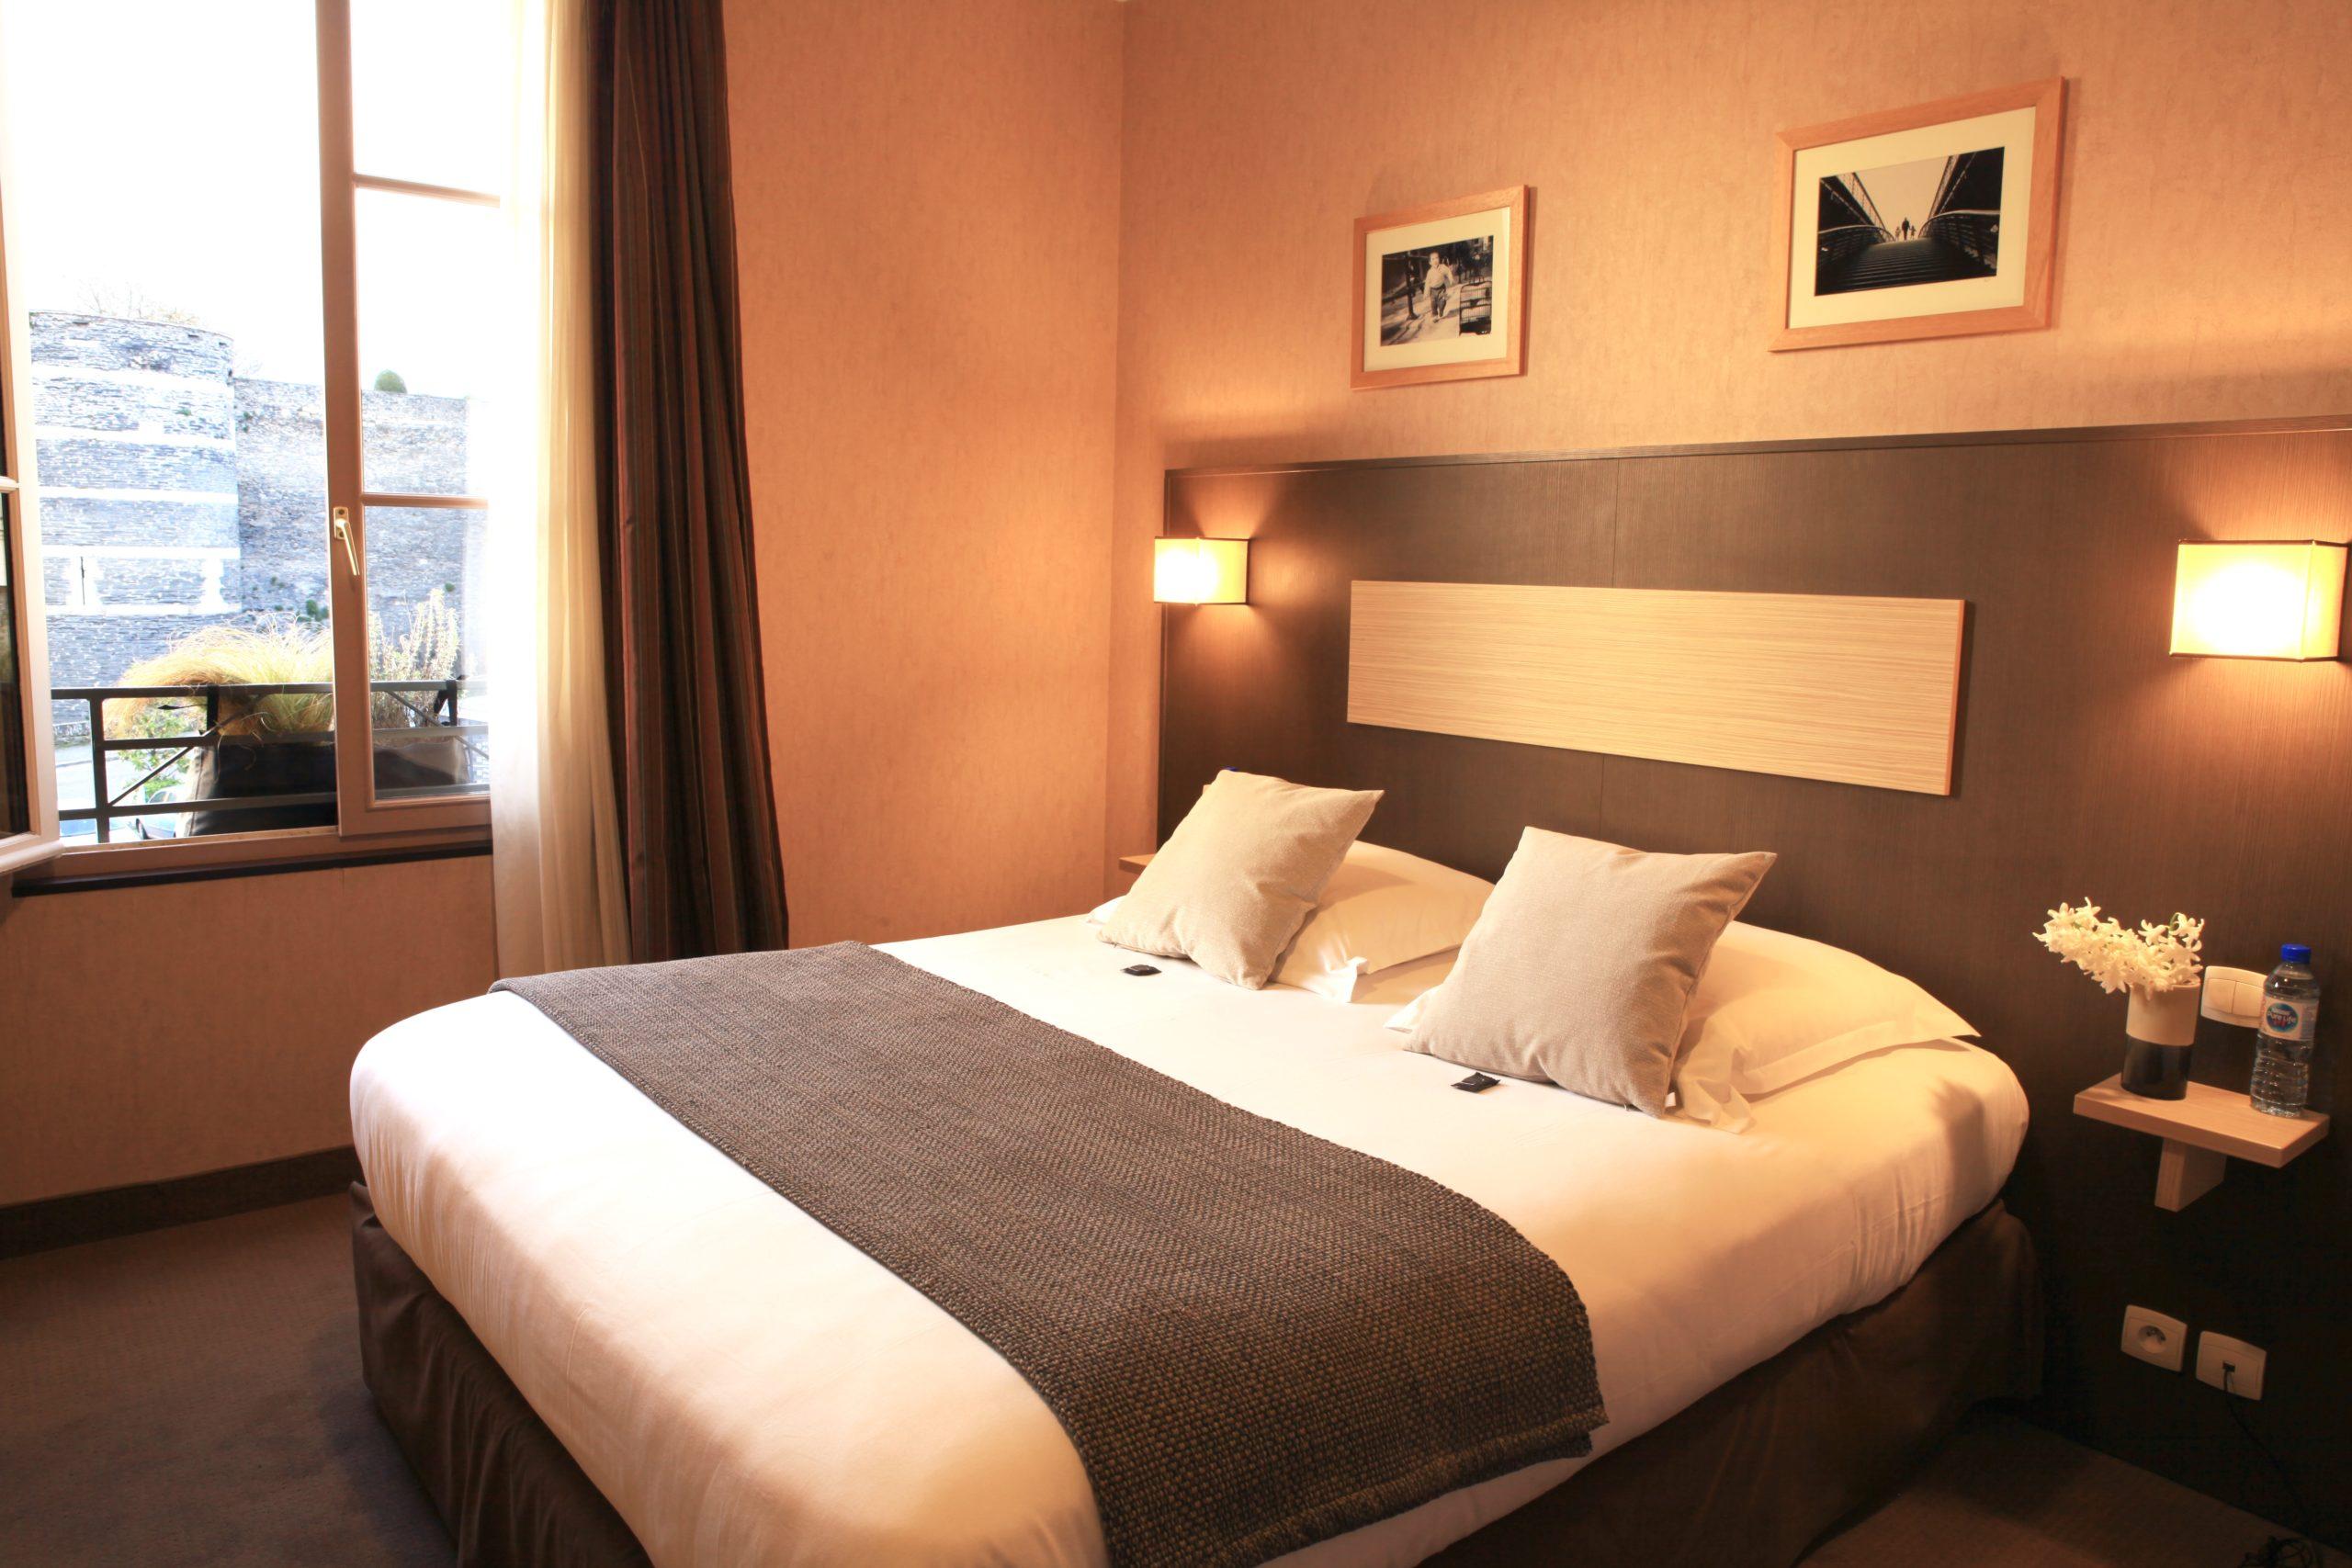 Chambre d'hôtel cosy à Angers : HMA hôtel